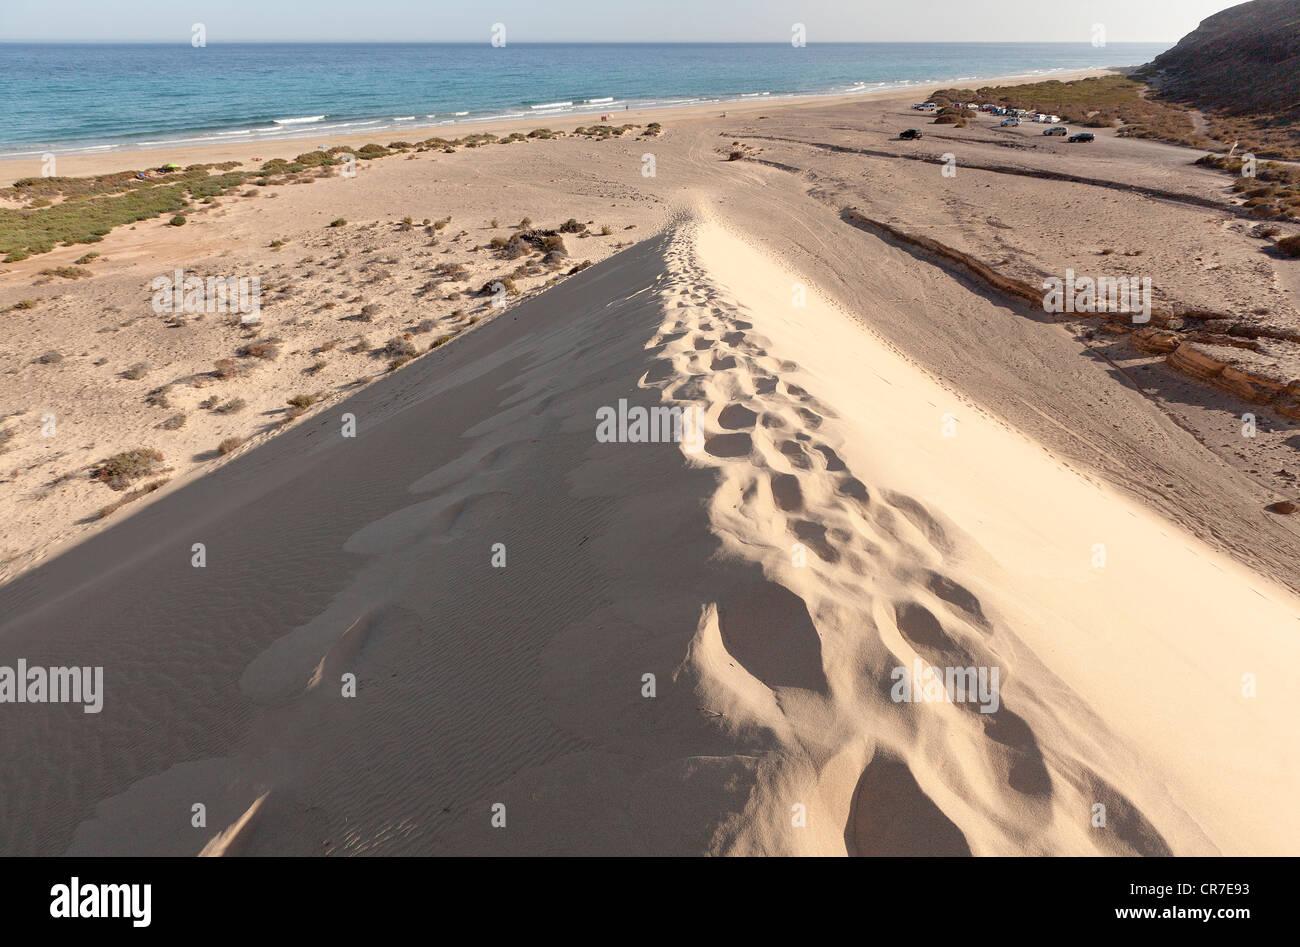 Footprints on a sand dune on the Playa de Sotavento, Leeward Beach, Fuerteventura, Canary Islands, Spain, Europe - Stock Image